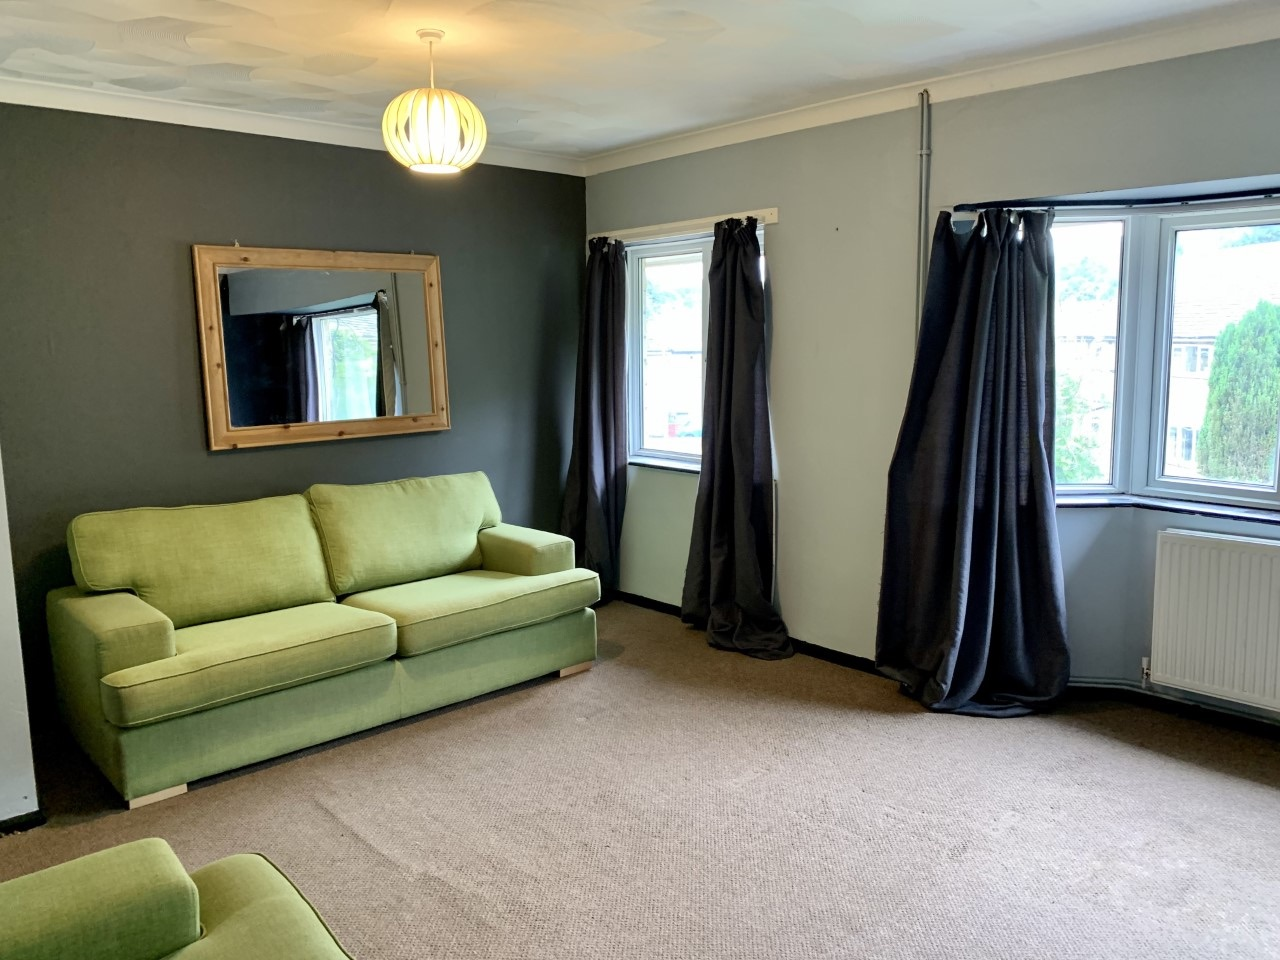 2 bedroom maisonette flat/apartment For Sale in Todmorden - Photograph 7.